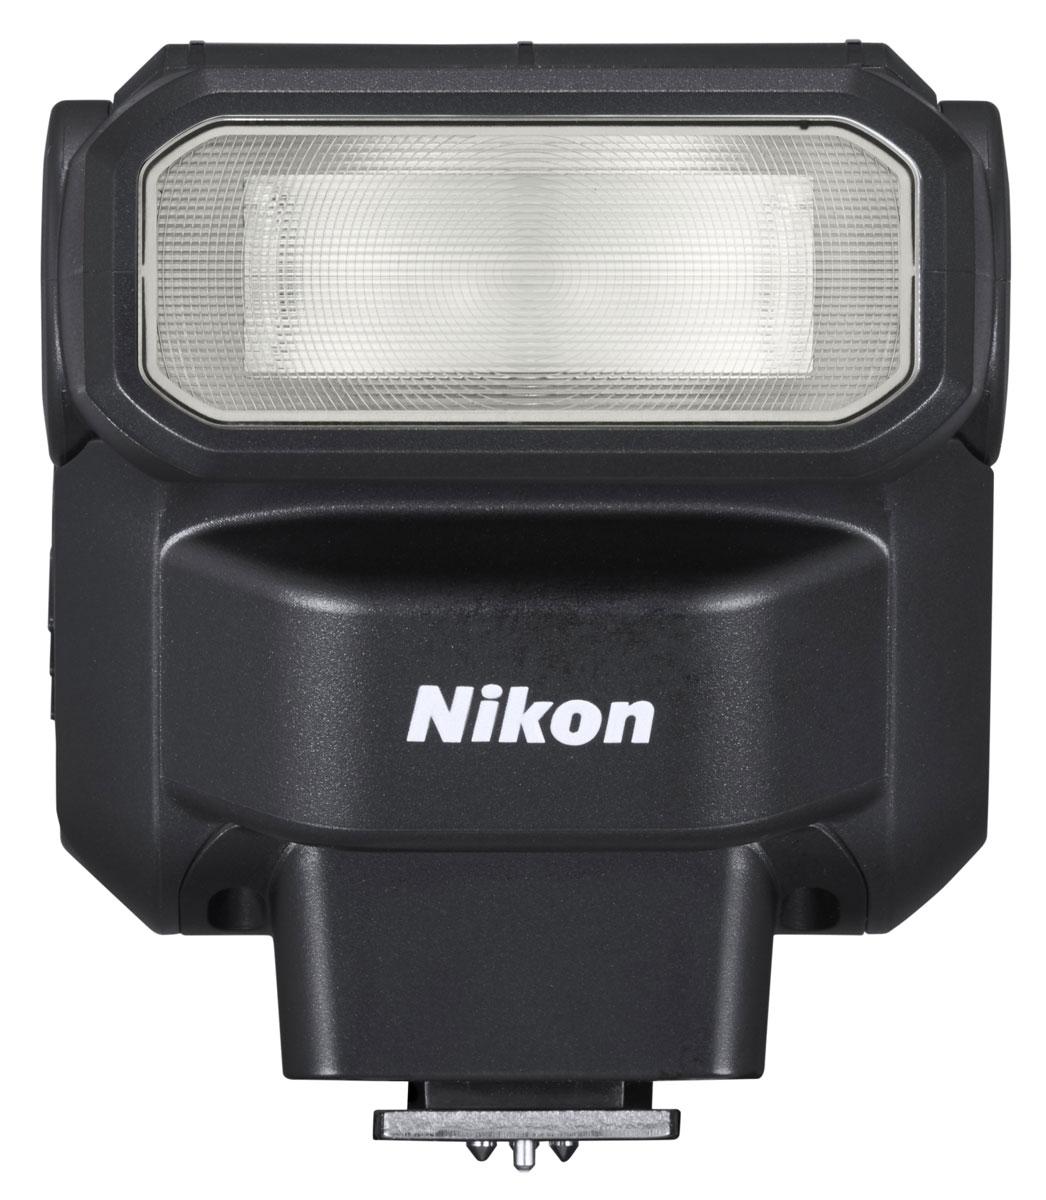 Nikon Speedlight SB-300 фотовспышка